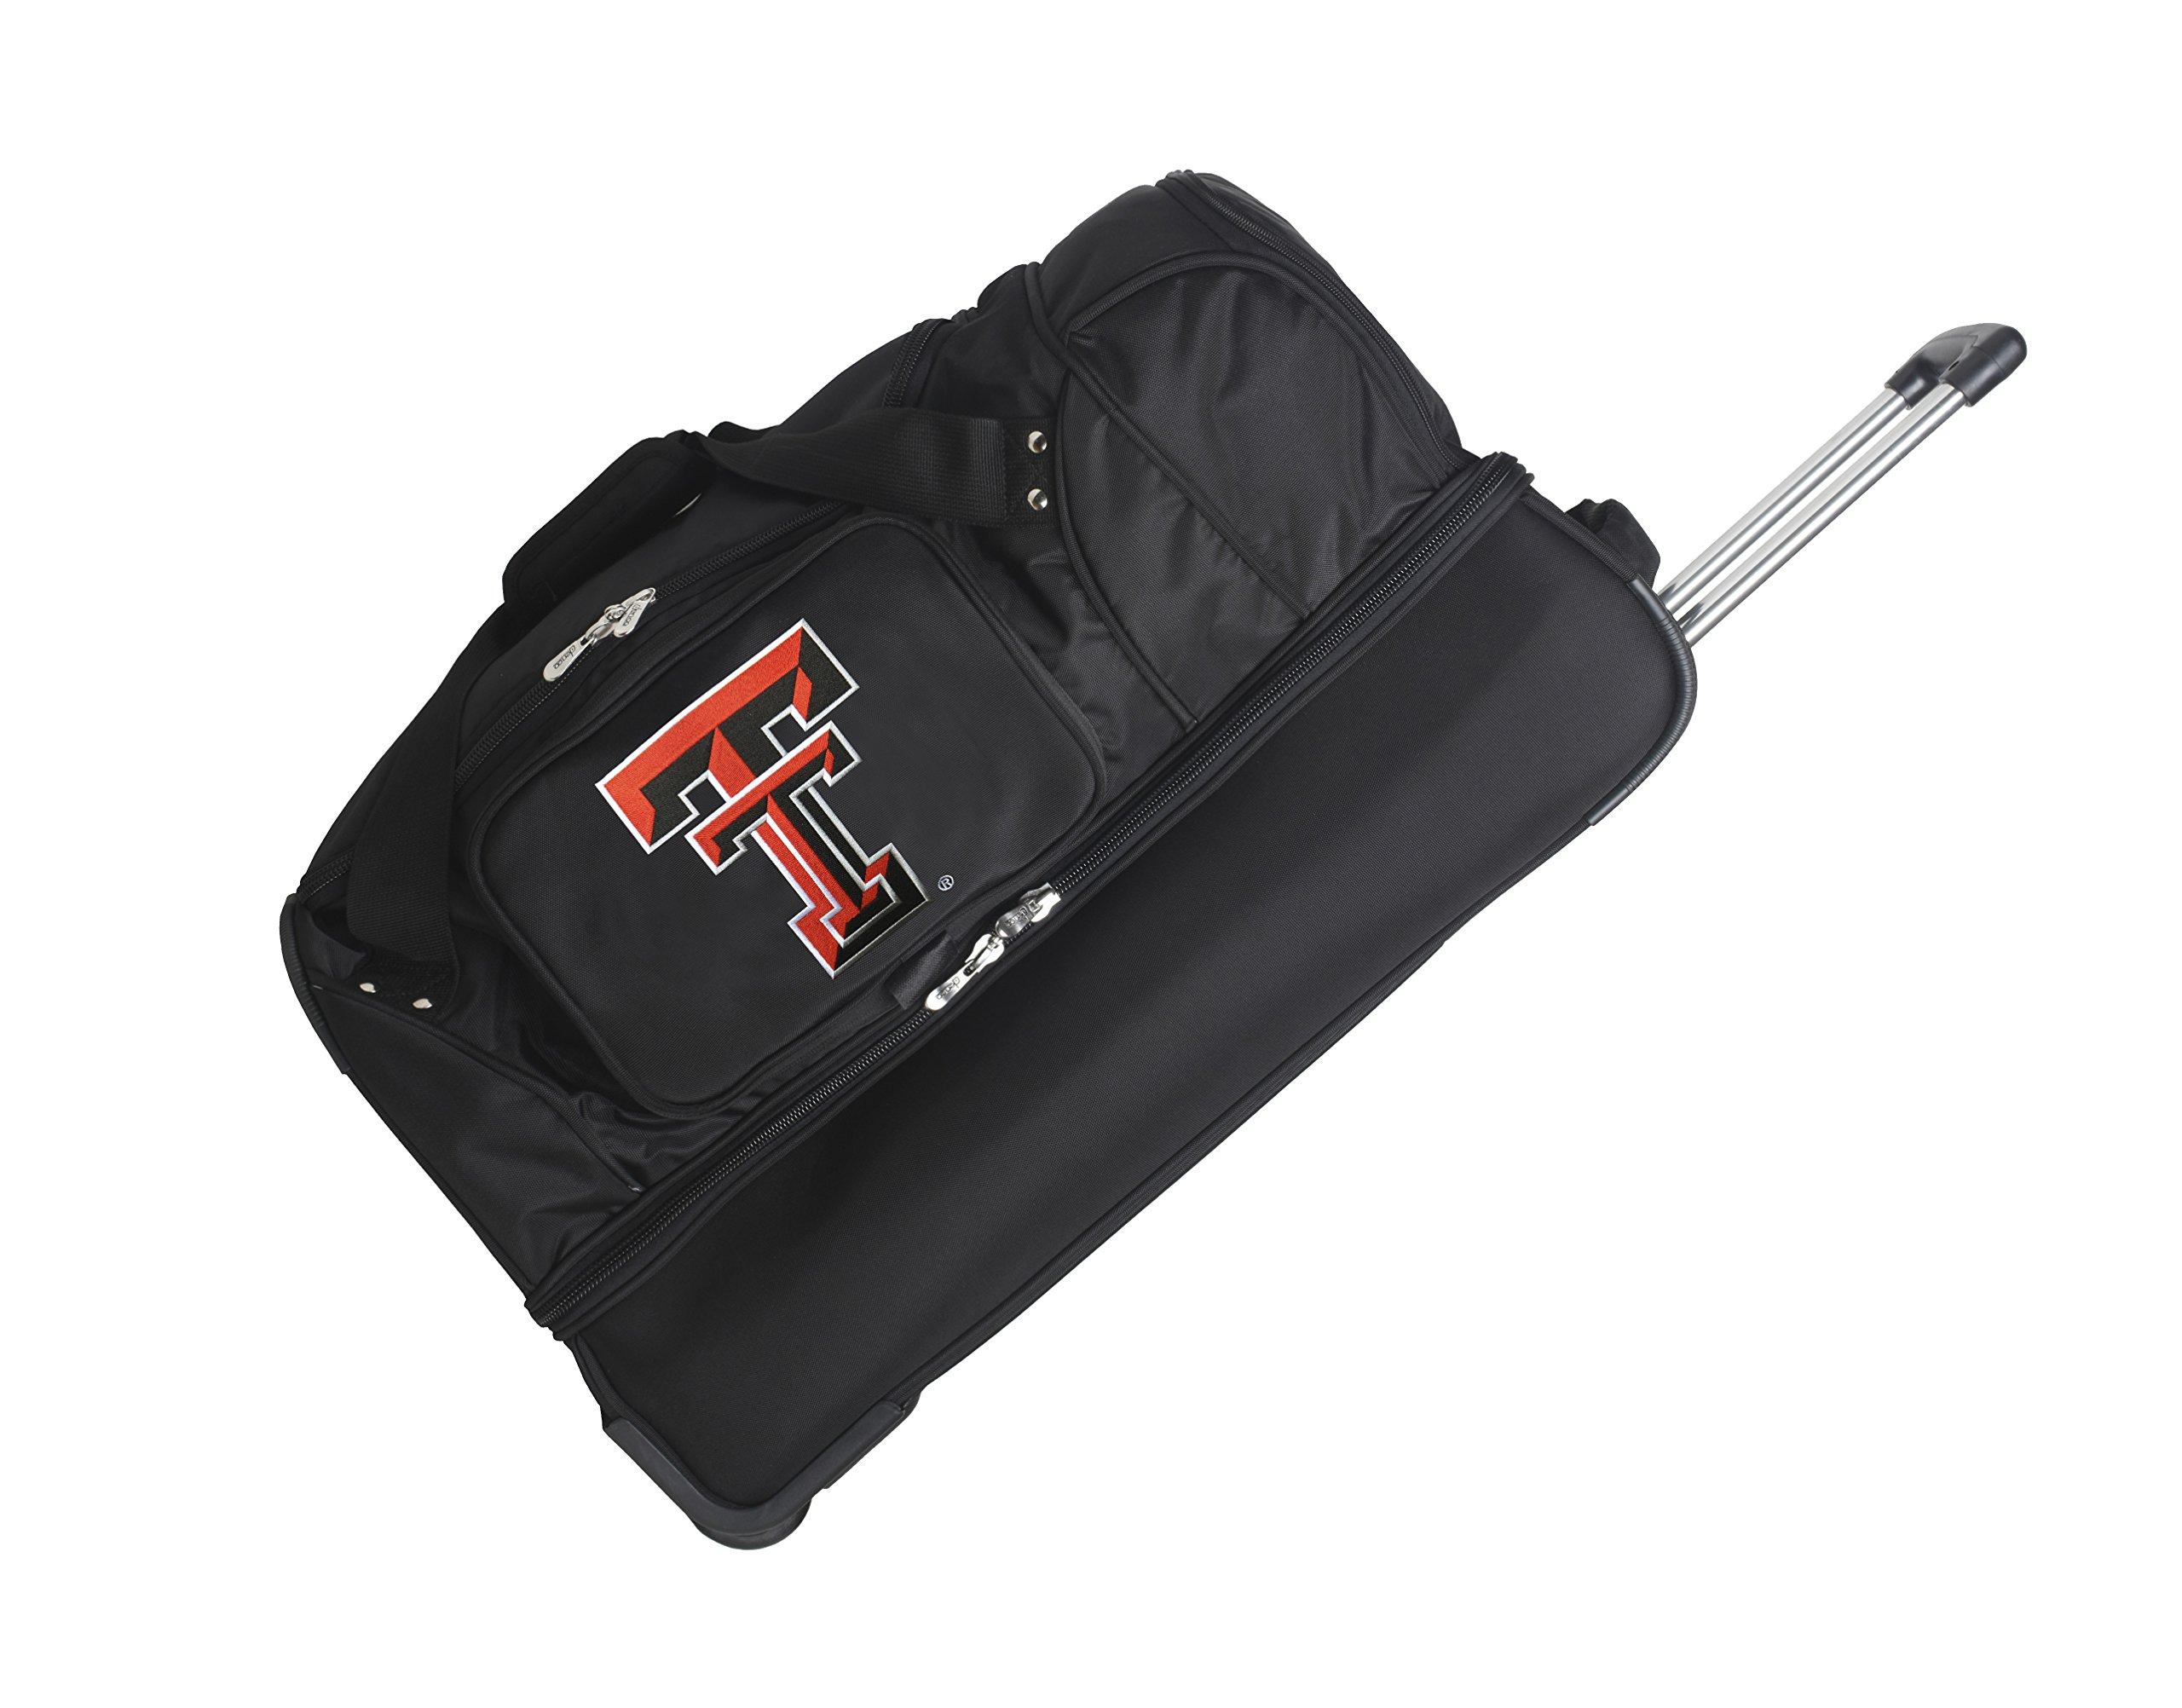 NCAA Texas Tech Red Raiders Rolling Drop-Bottom Duffel by Denco (Image #1)